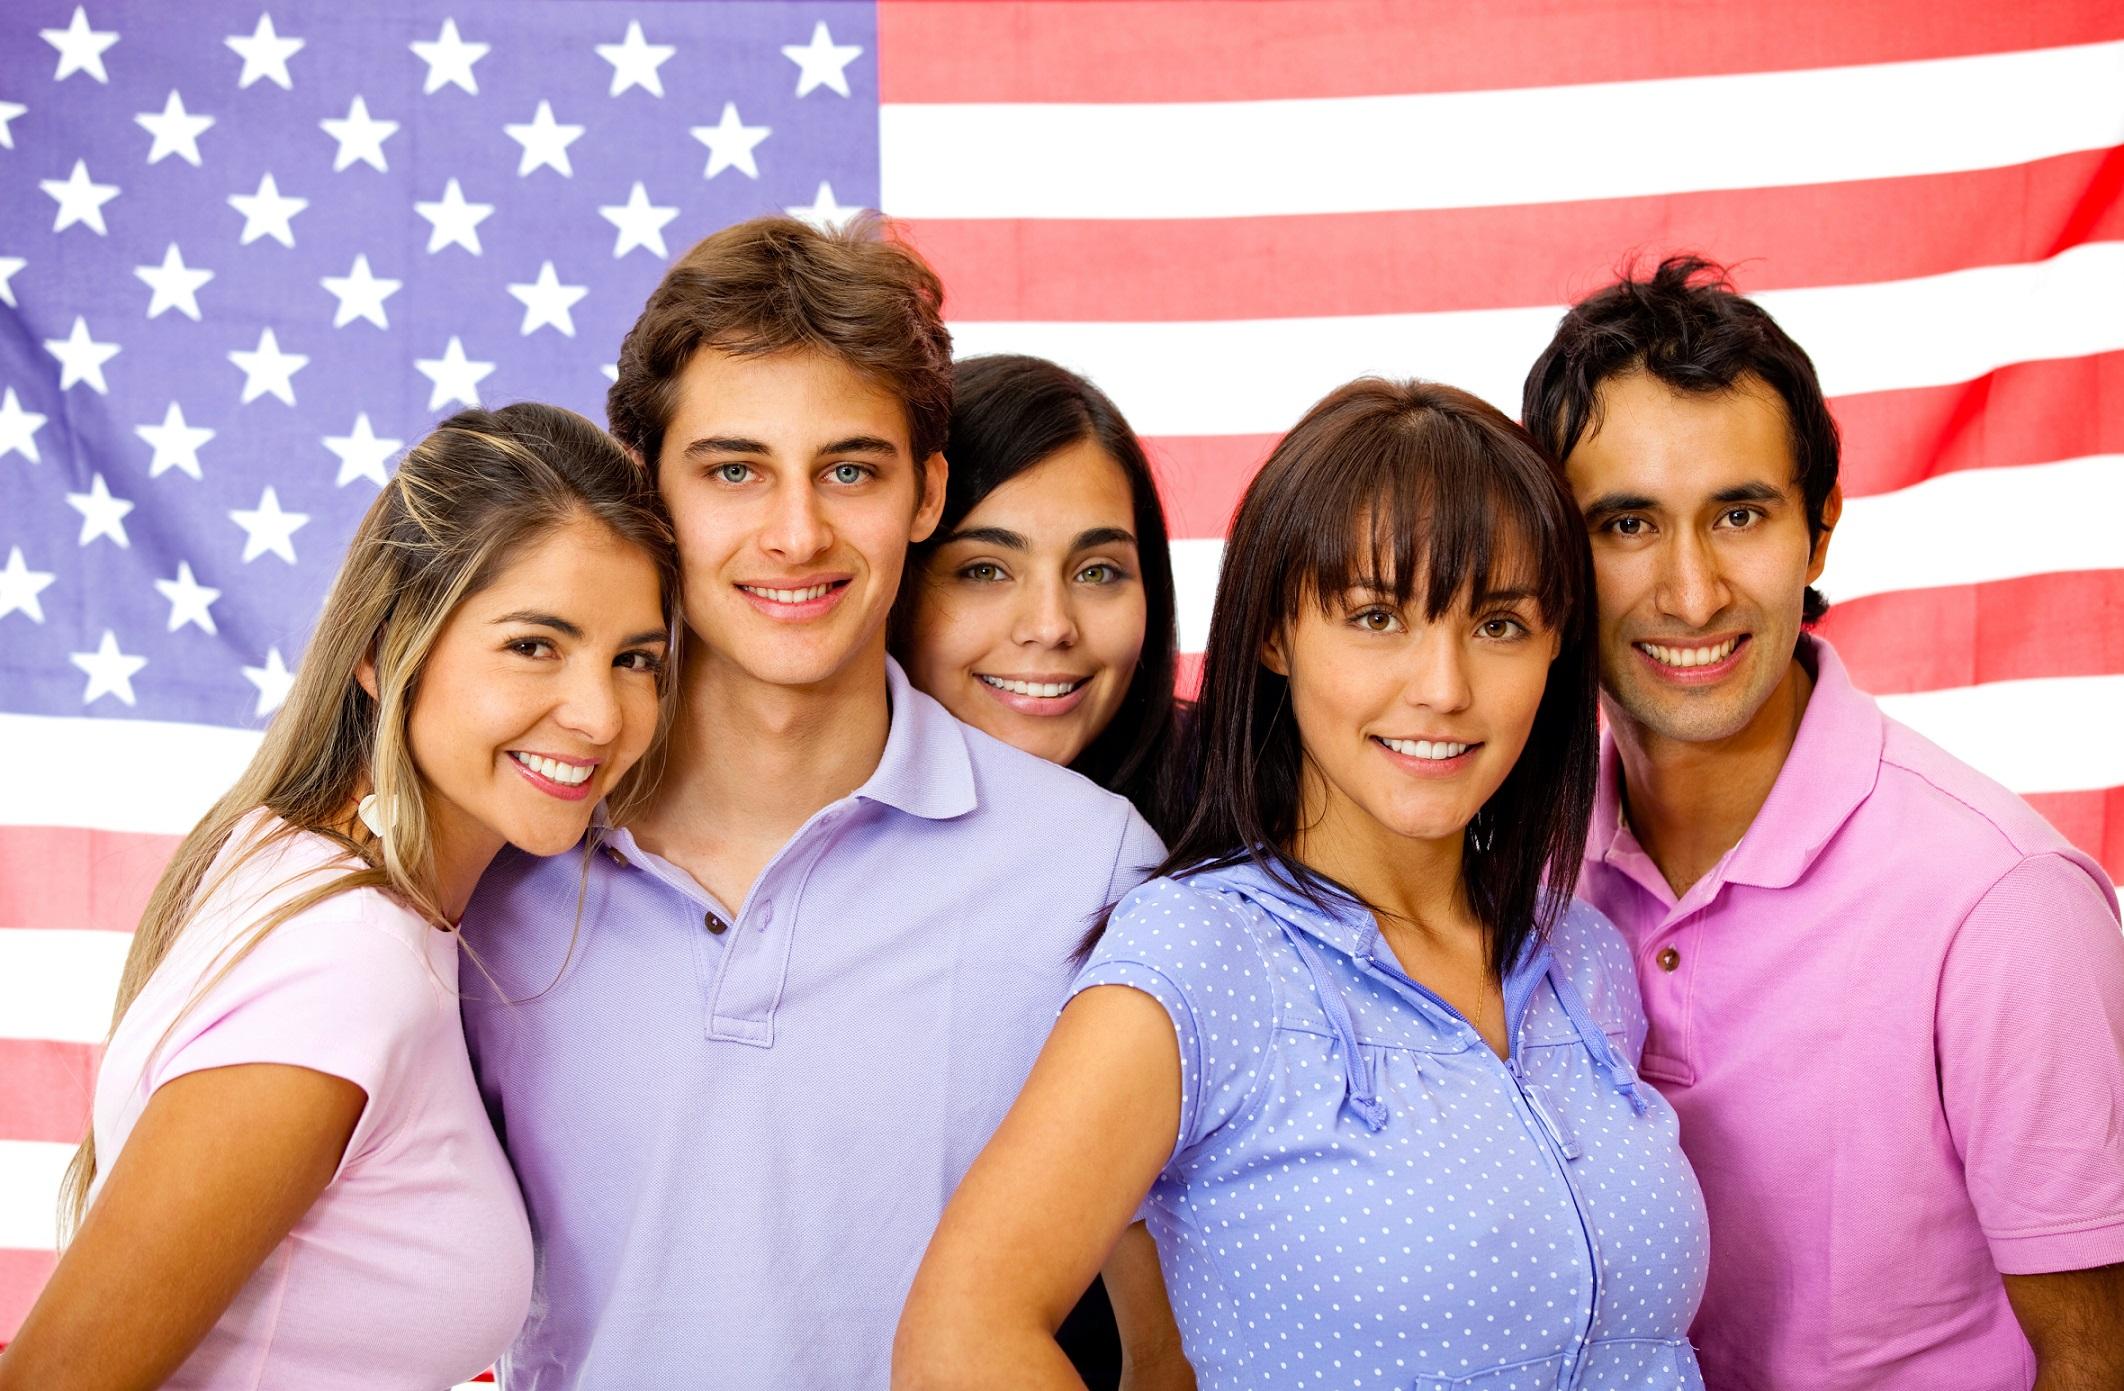 International student dating american